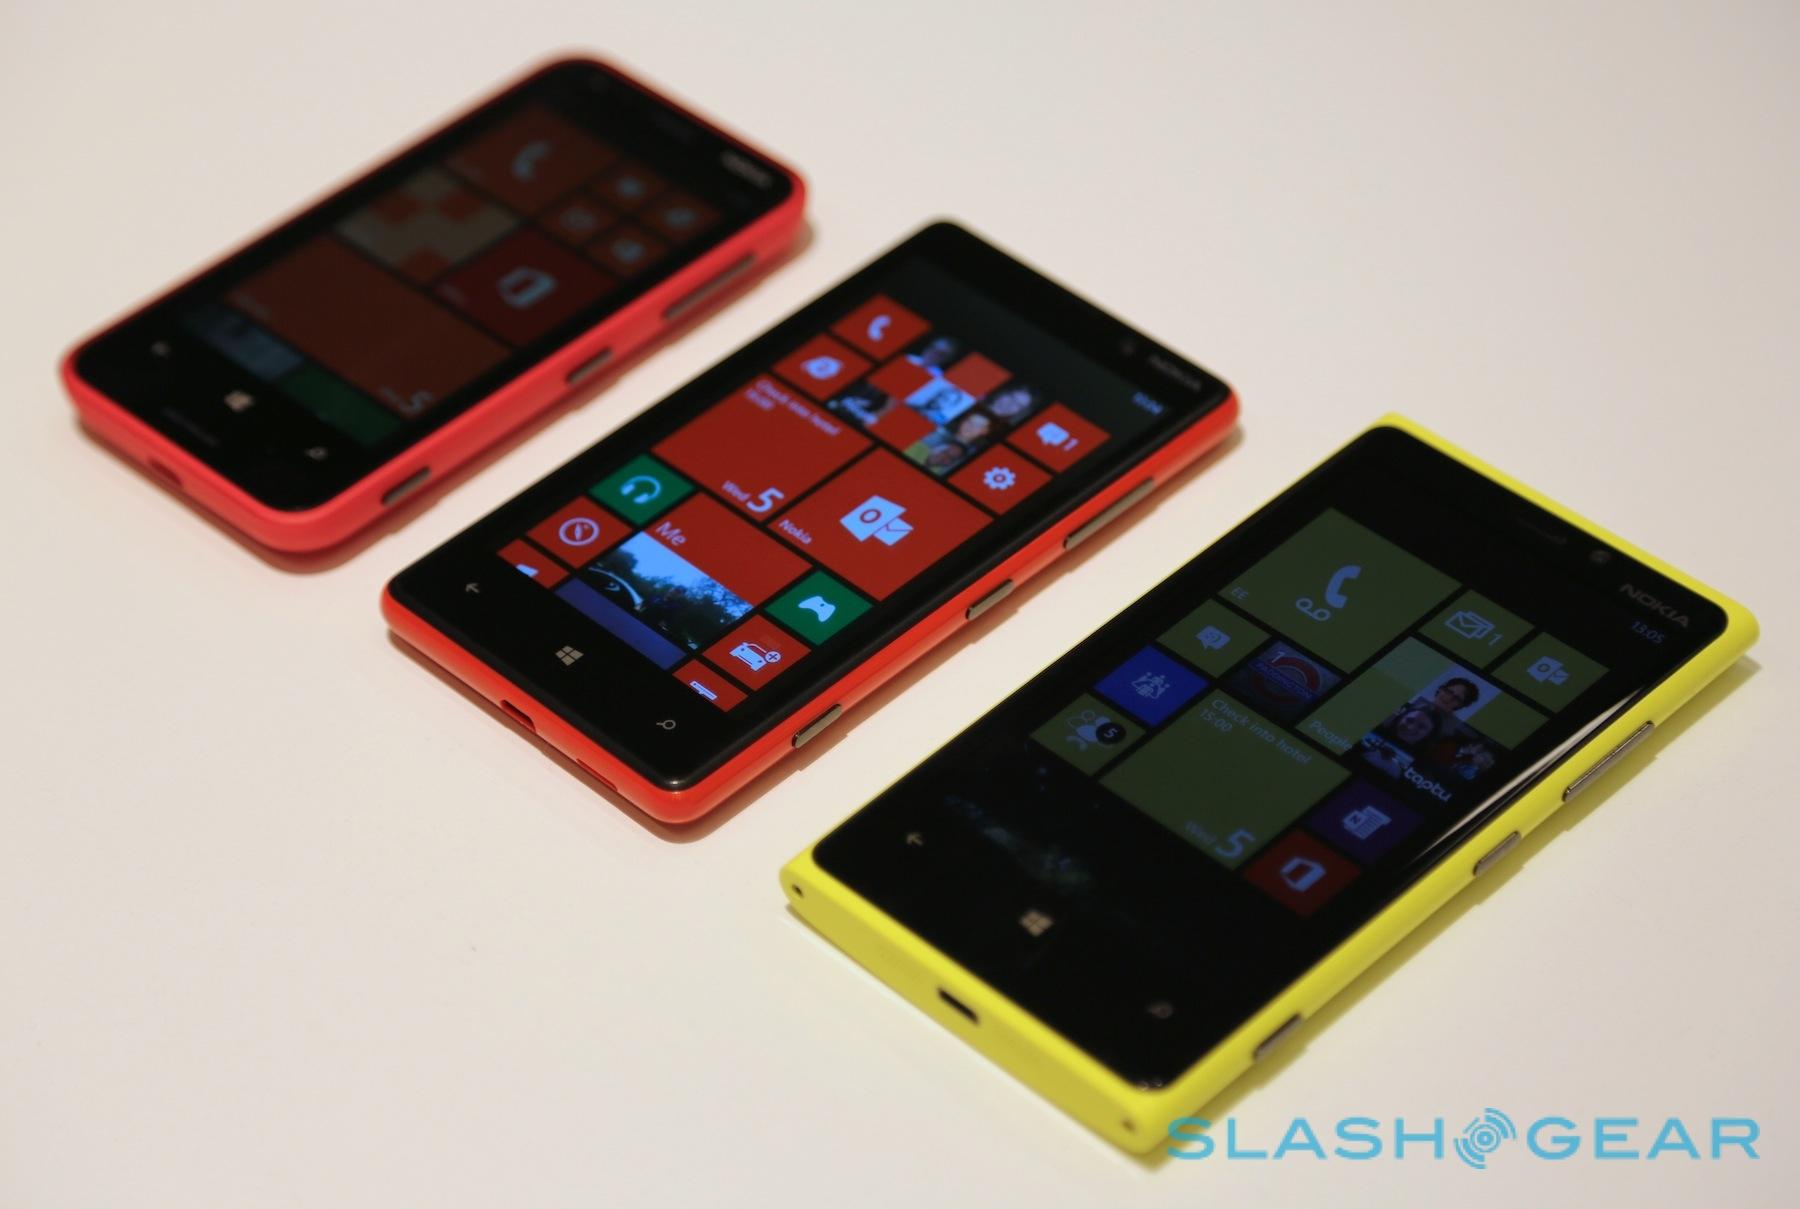 nokia lumia 620 hands on 13 150x100 Nokia Lumia 620 galeria